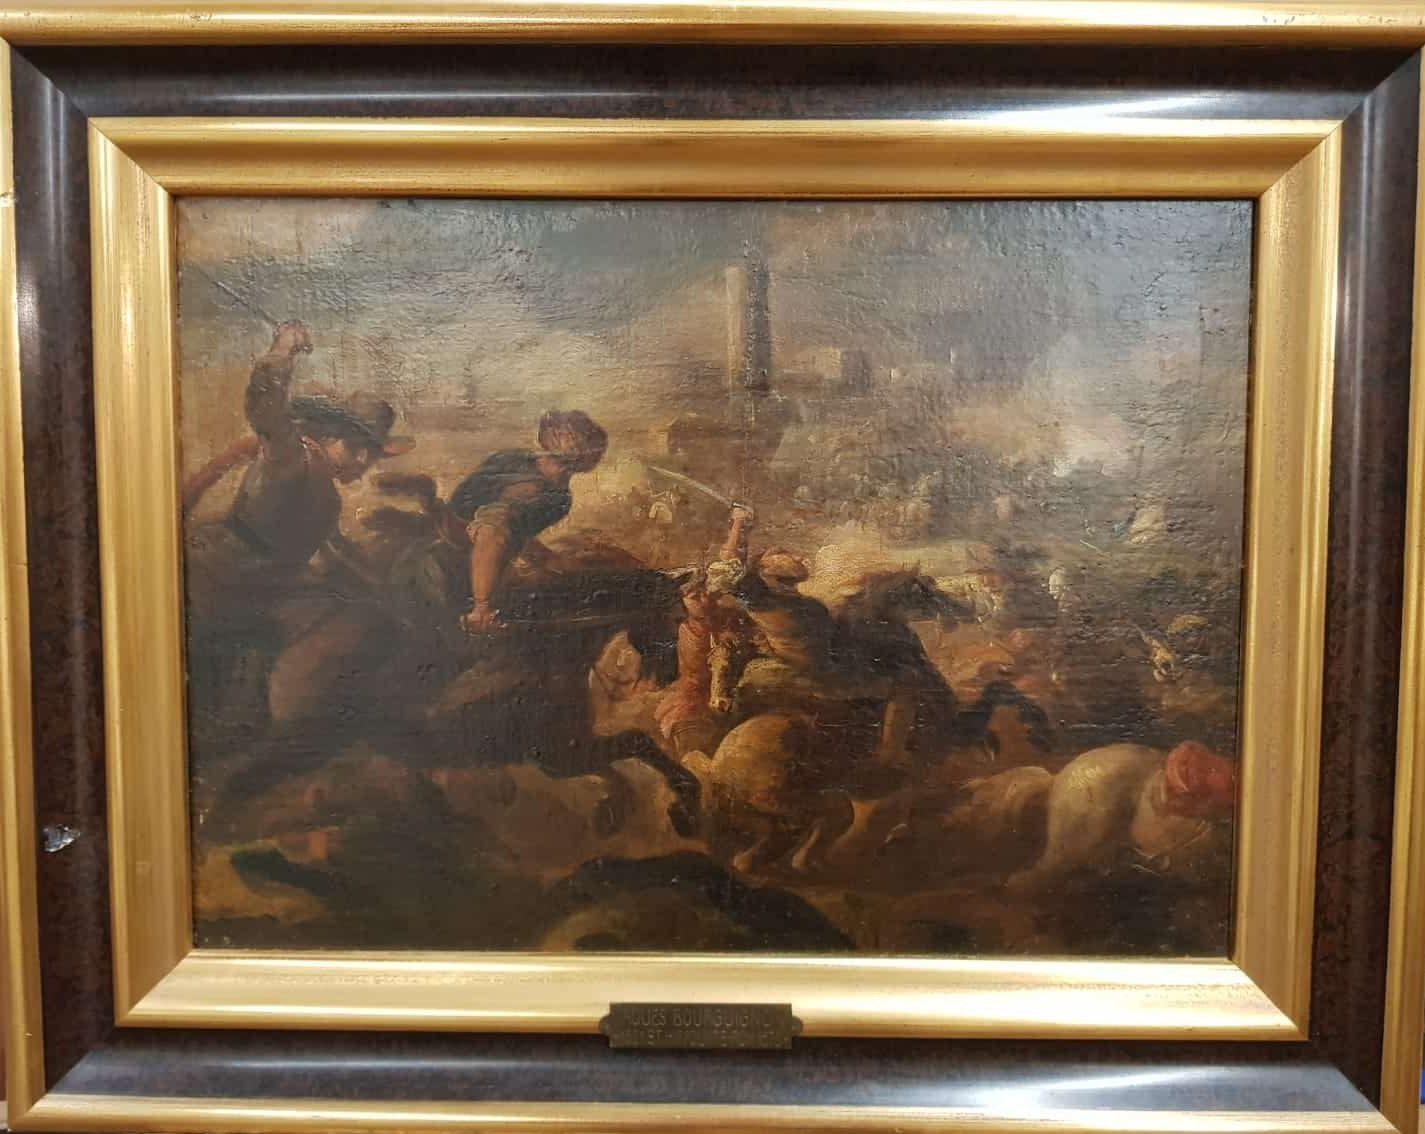 Jaques Bourguignon Zwei Schlachtenszenen Nr.1 • Antiquitäten